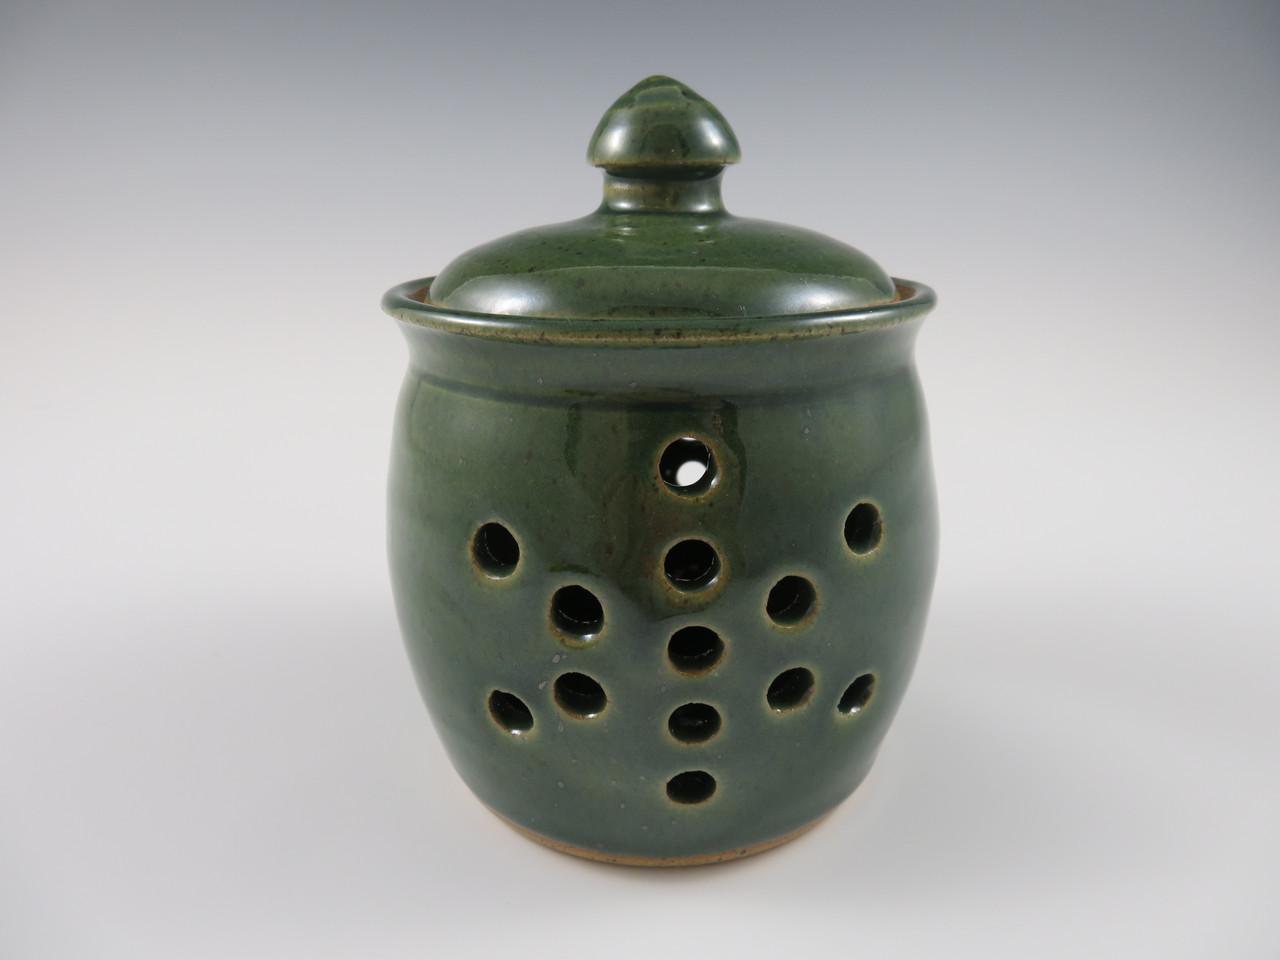 Garlic Pot in Ivy Green